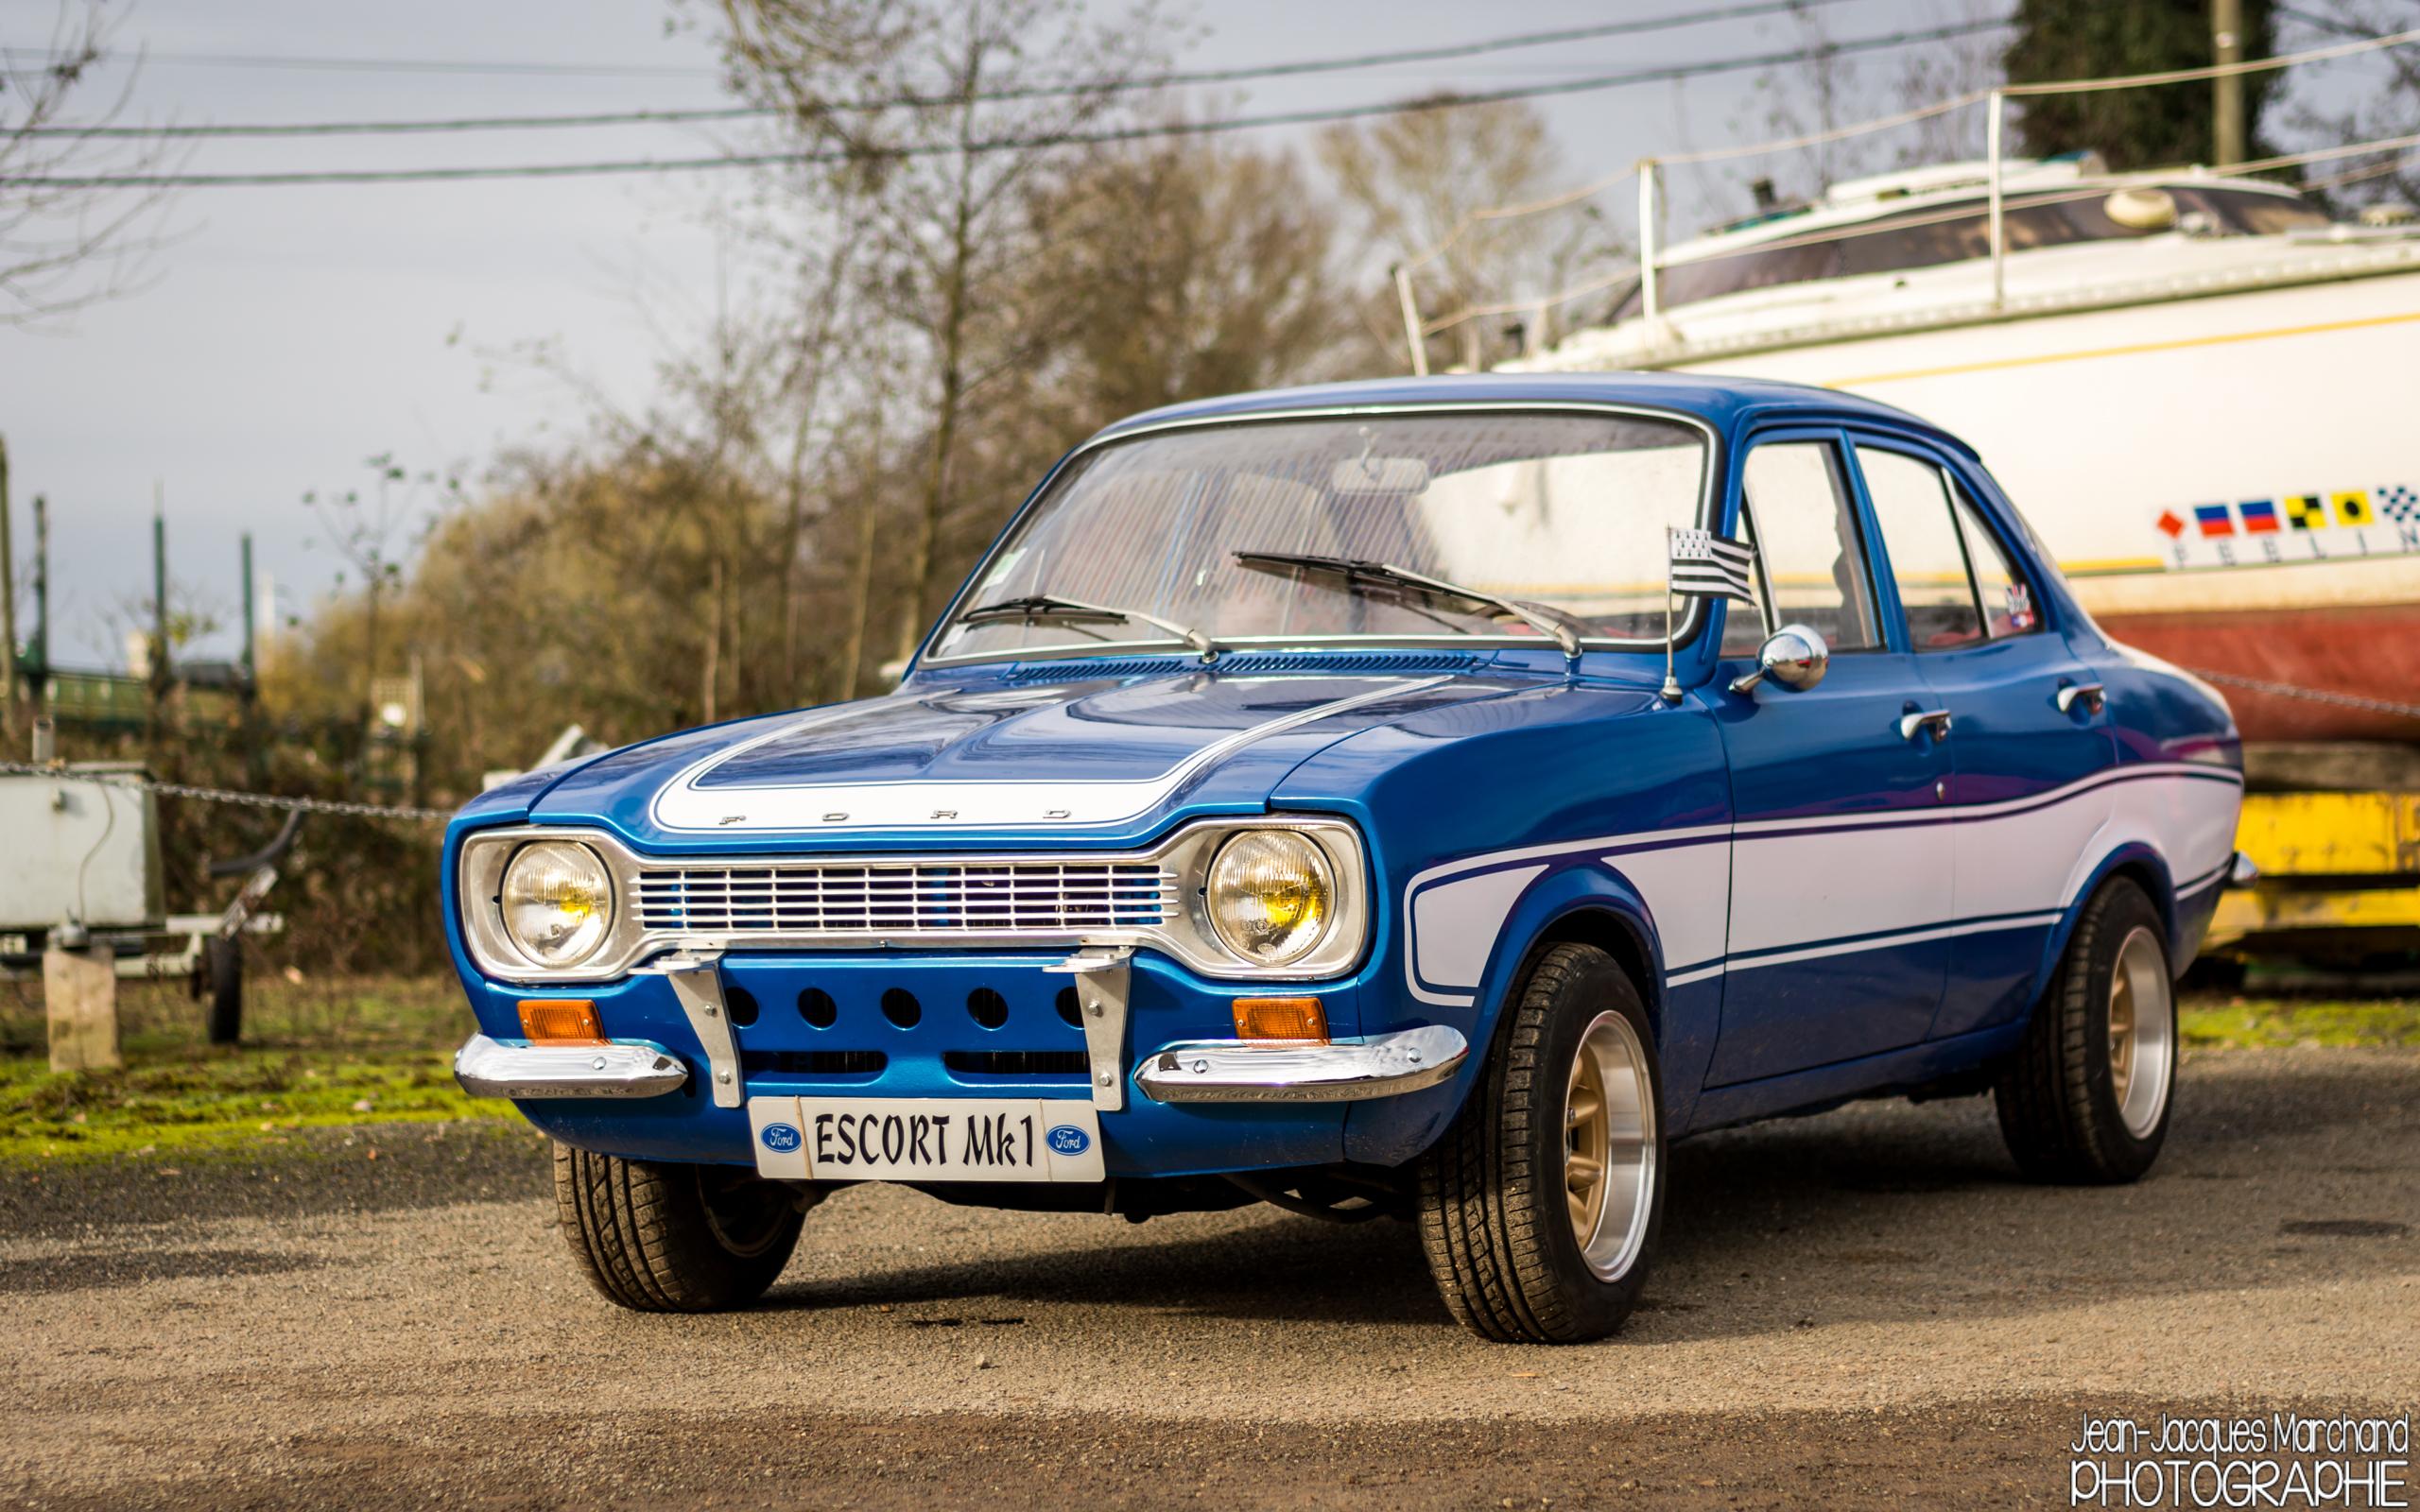 Wallpaper : auto, blue, cars, Ford, car, america, Nikon, automobile ...